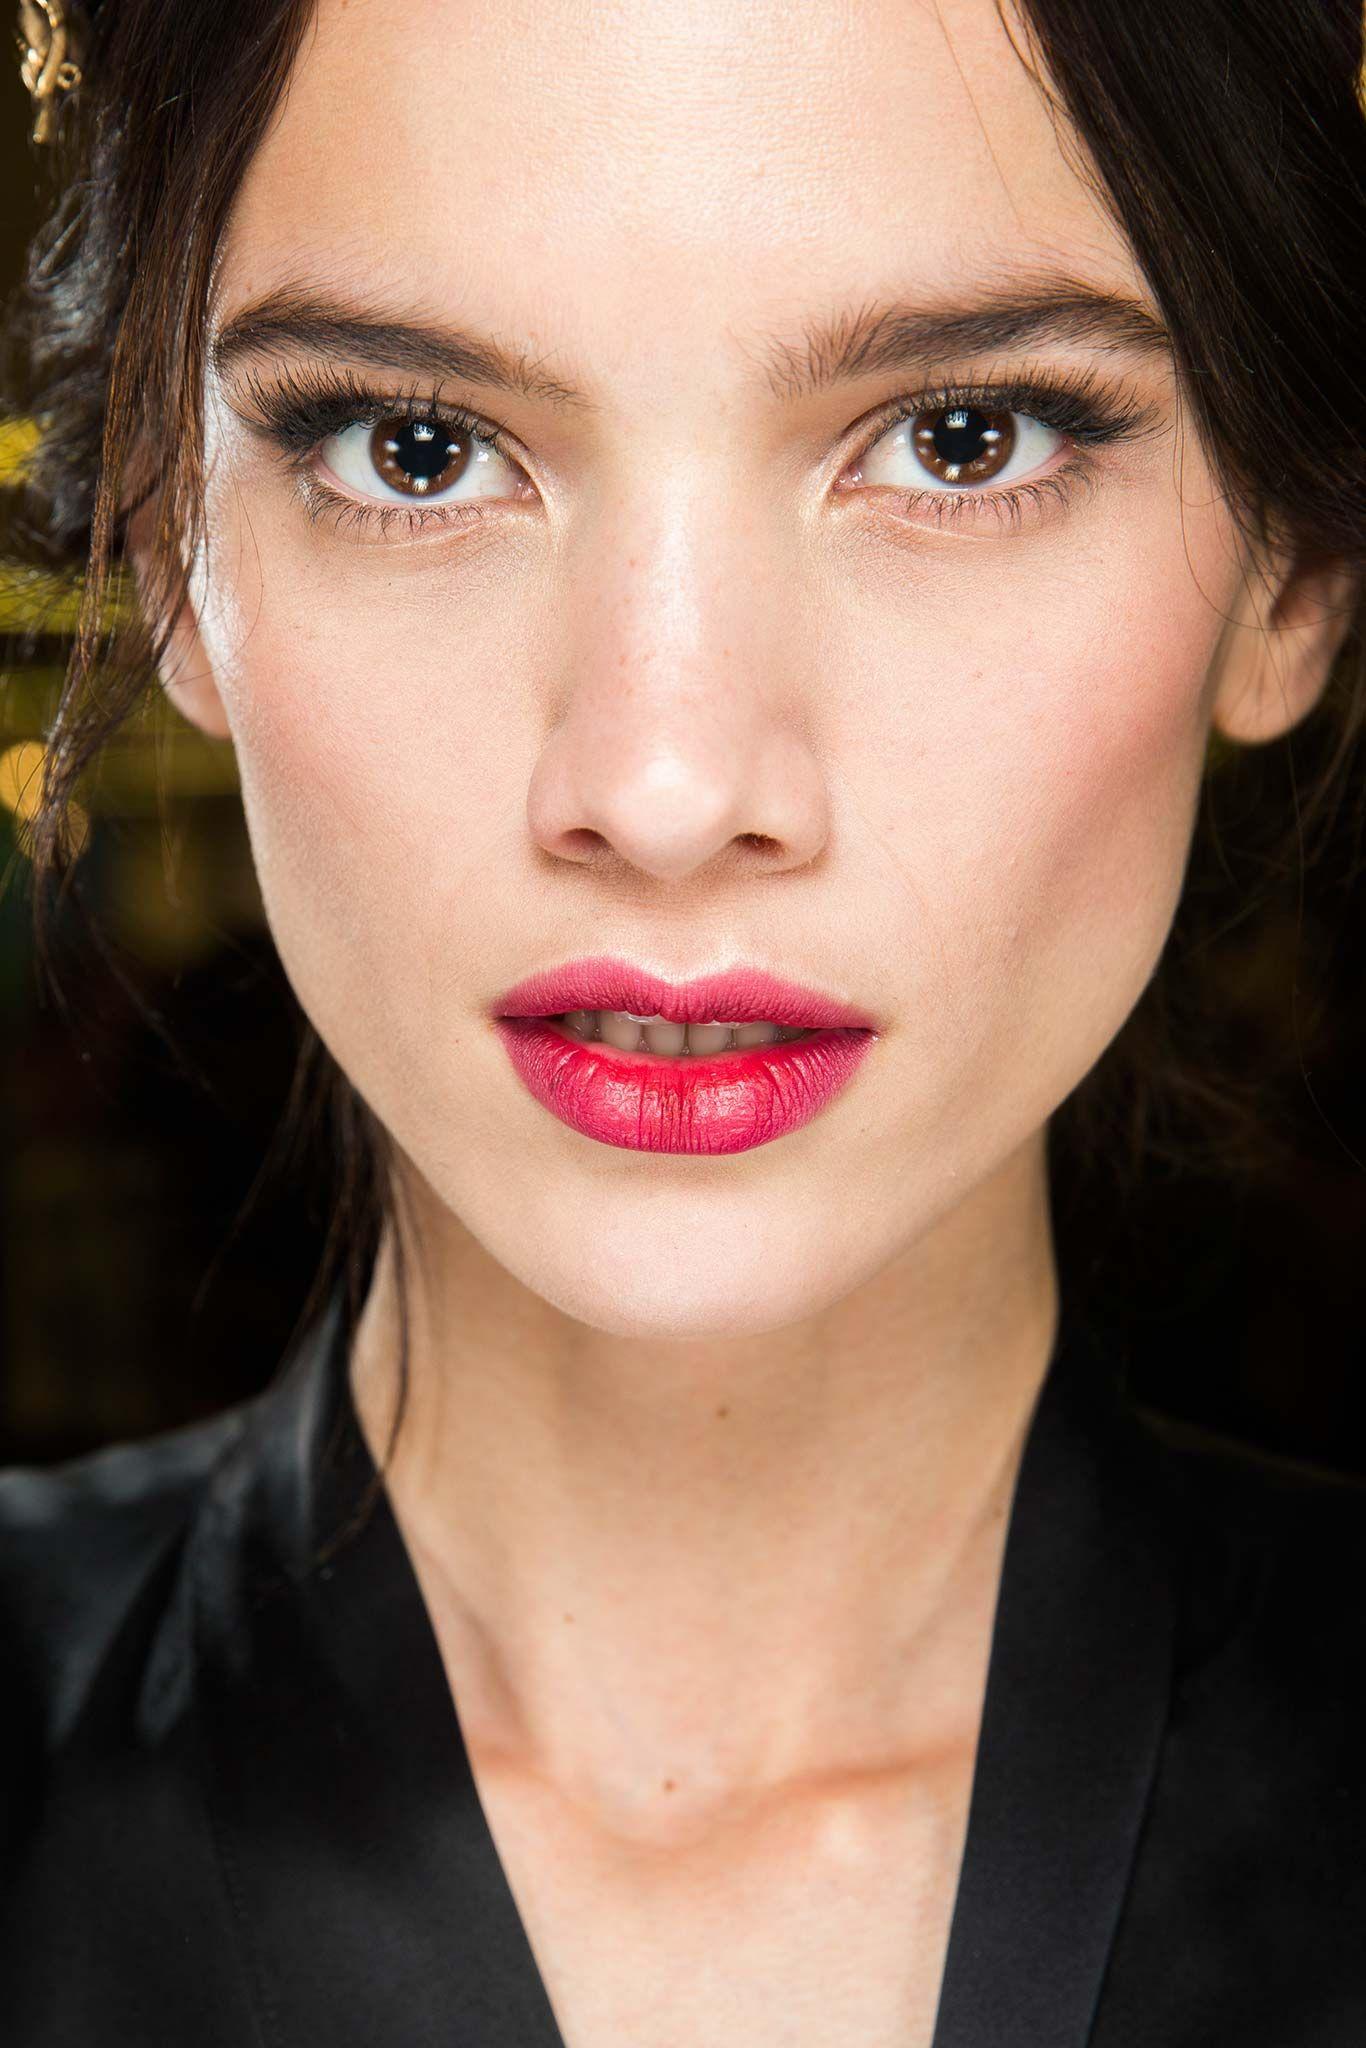 Dolce & Gabbana Fall 2015 Makeup Show beauty, Fashion